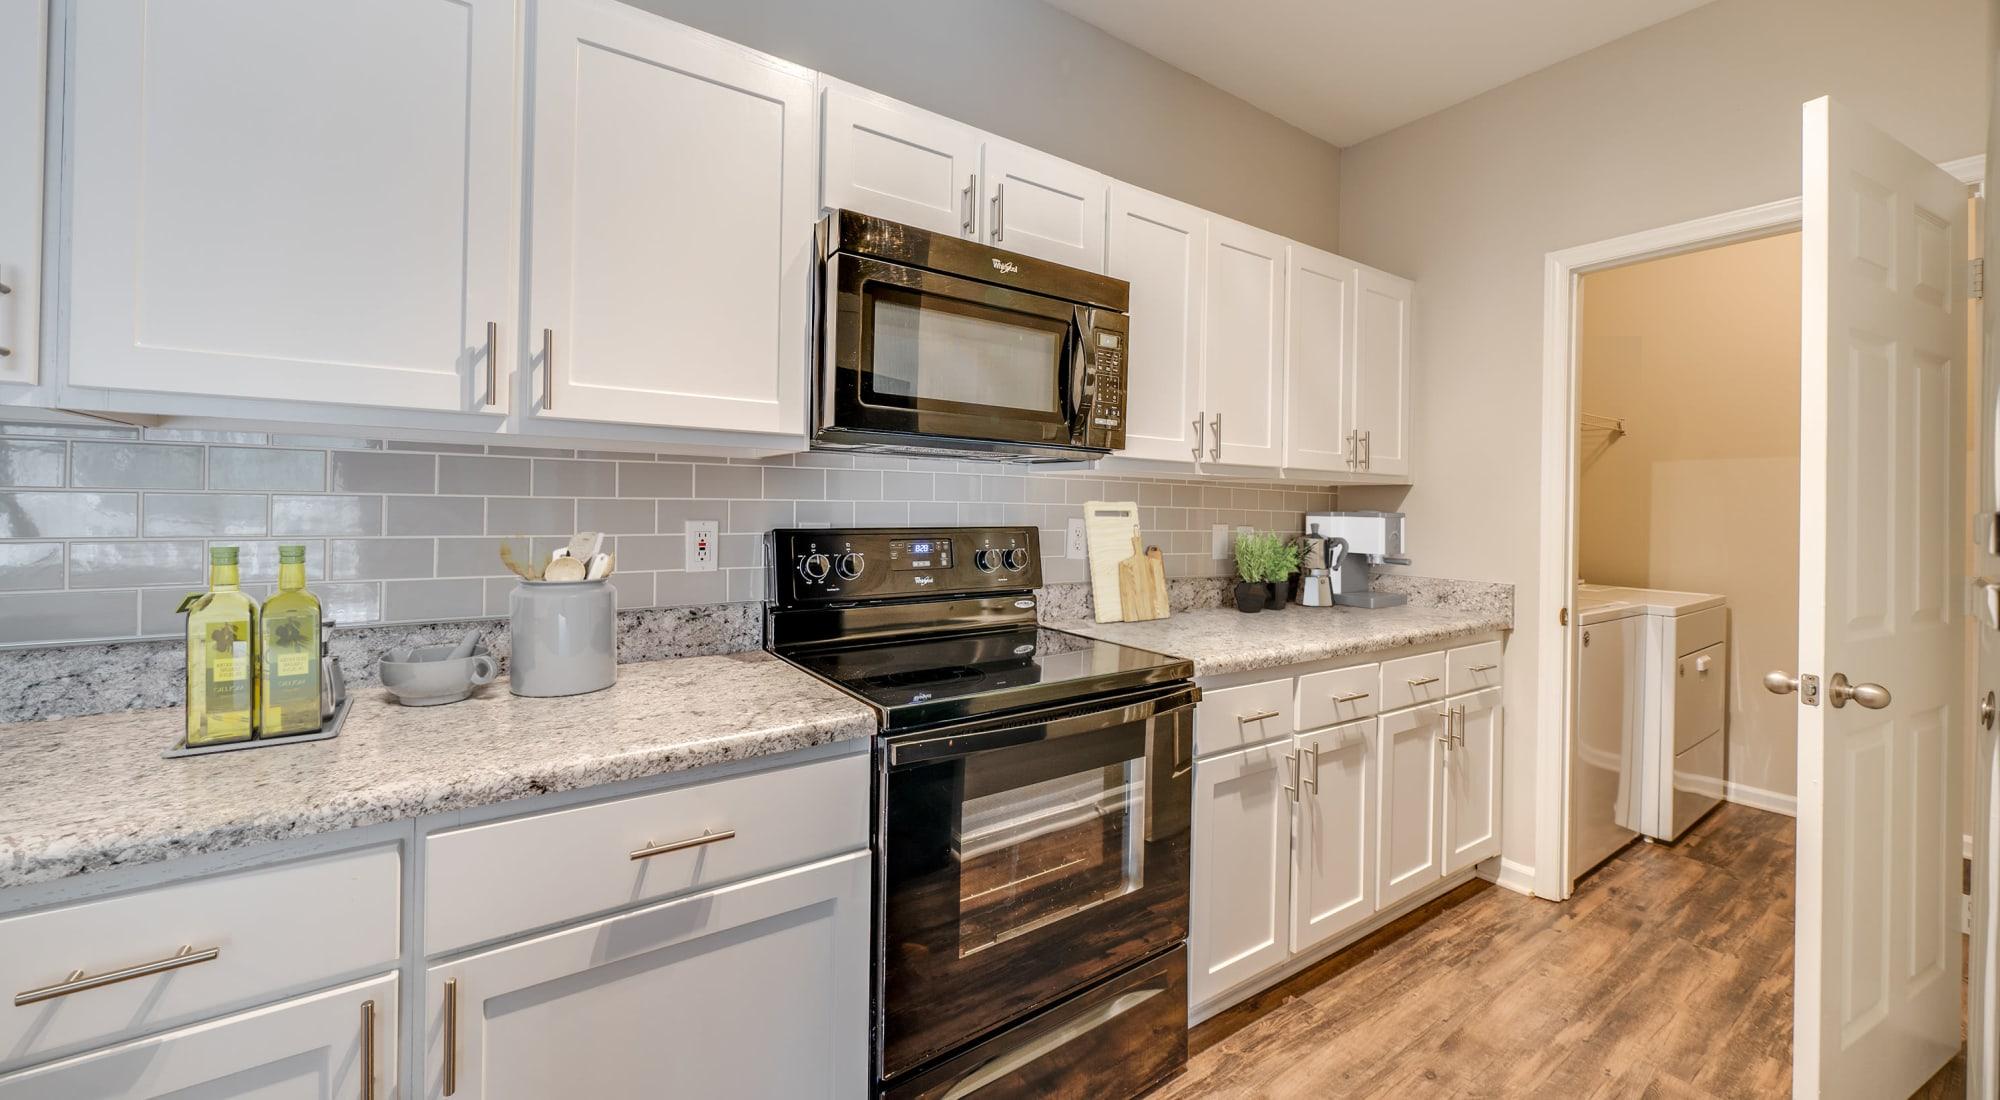 Apartments in Morrisville, North Carolina at Preston View